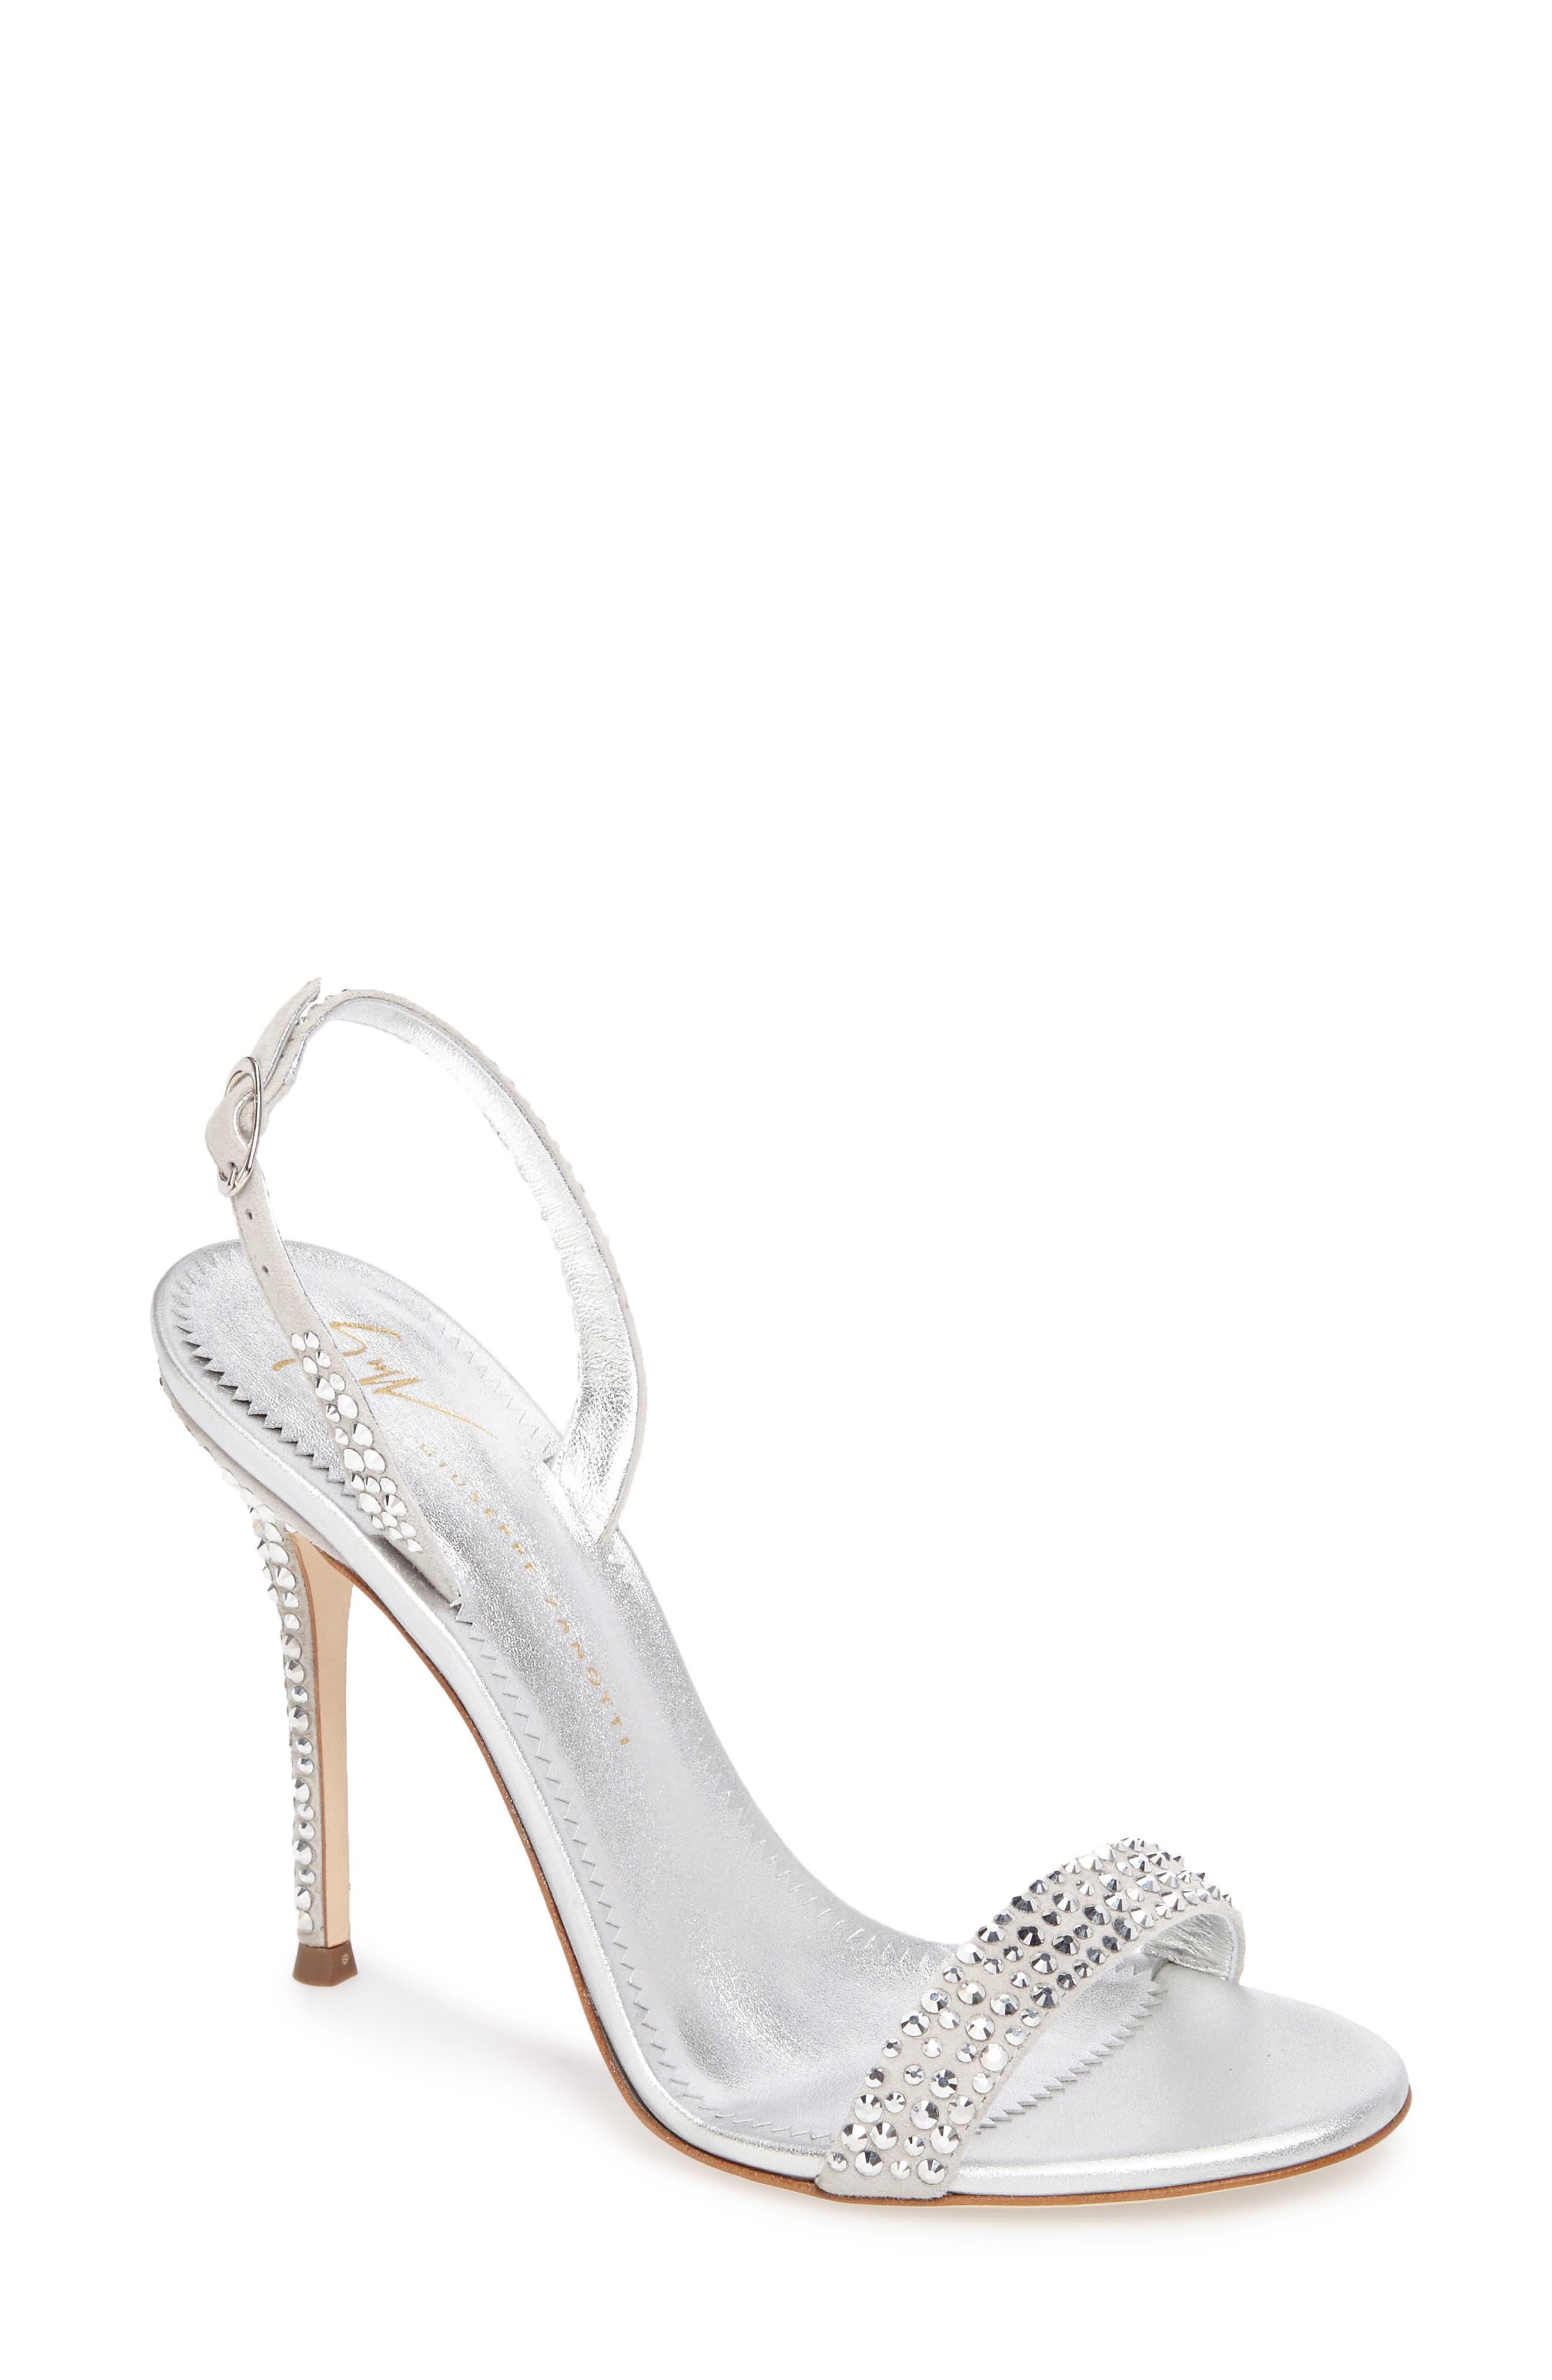 Main Image - Giuseppe Zanotti Musitco Crystal Embellished Slingback Sandal (Women)